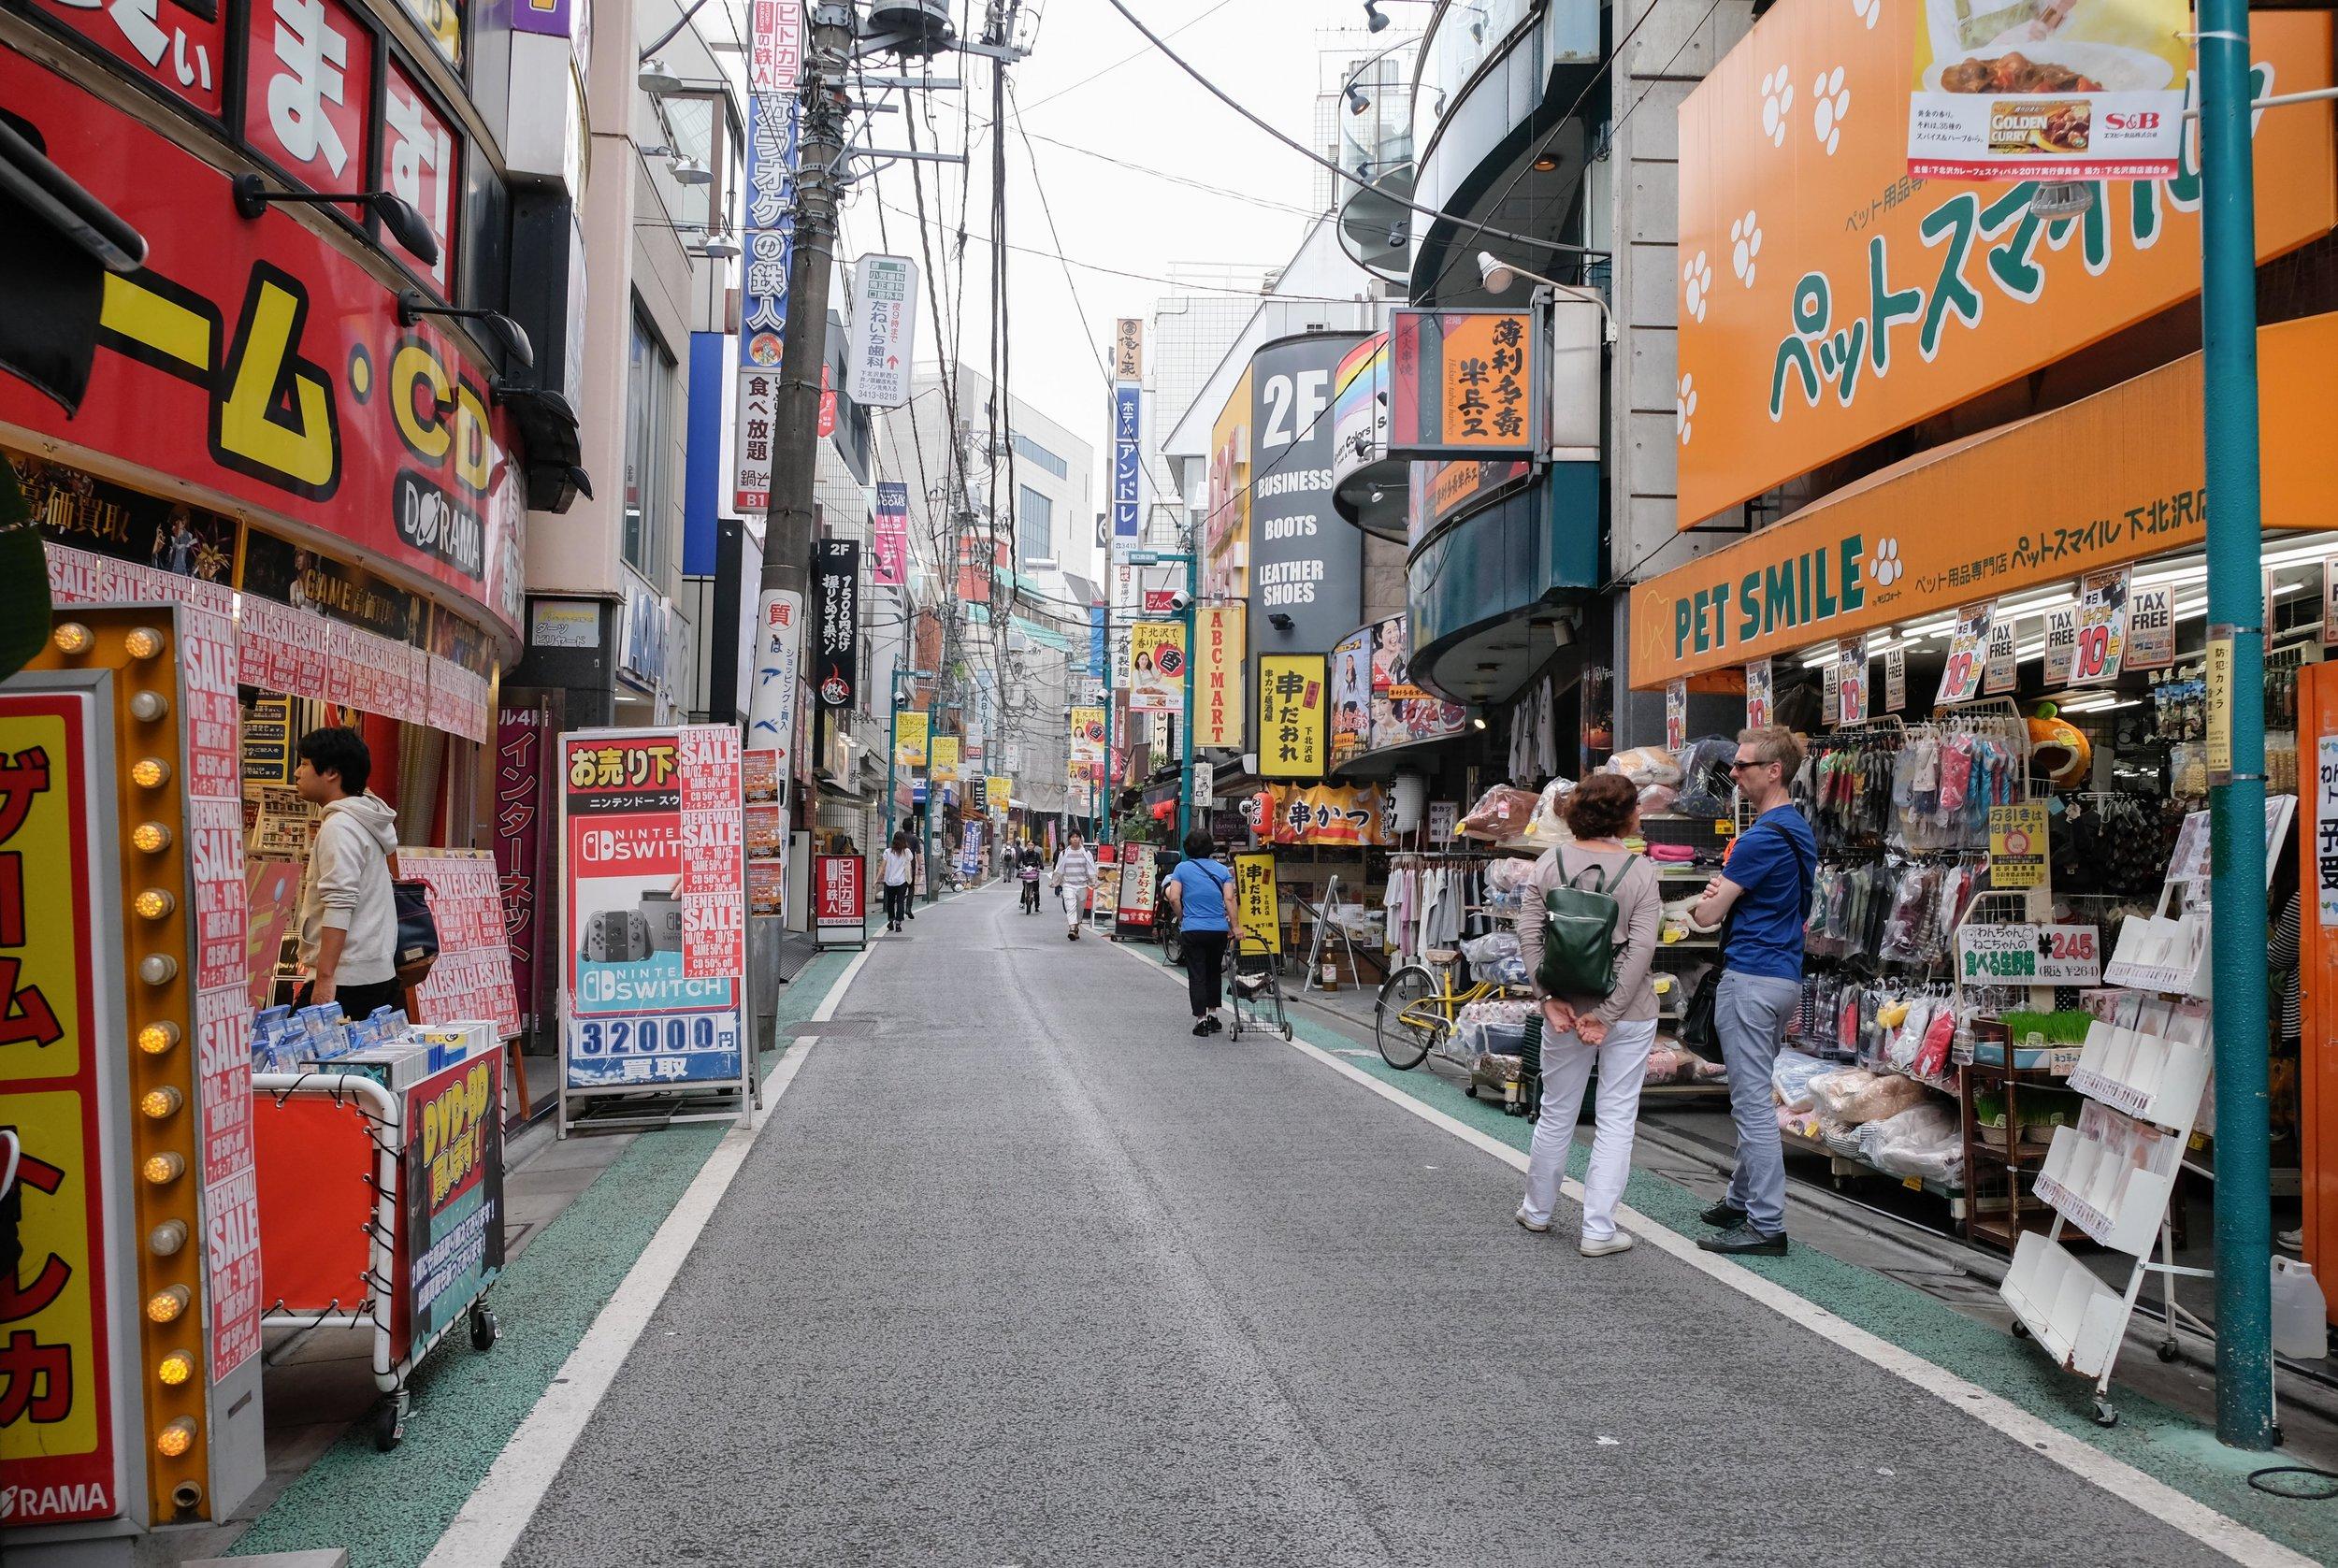 Tokyo neighborhood guide: Shimokitazawa - October 24th, 2017